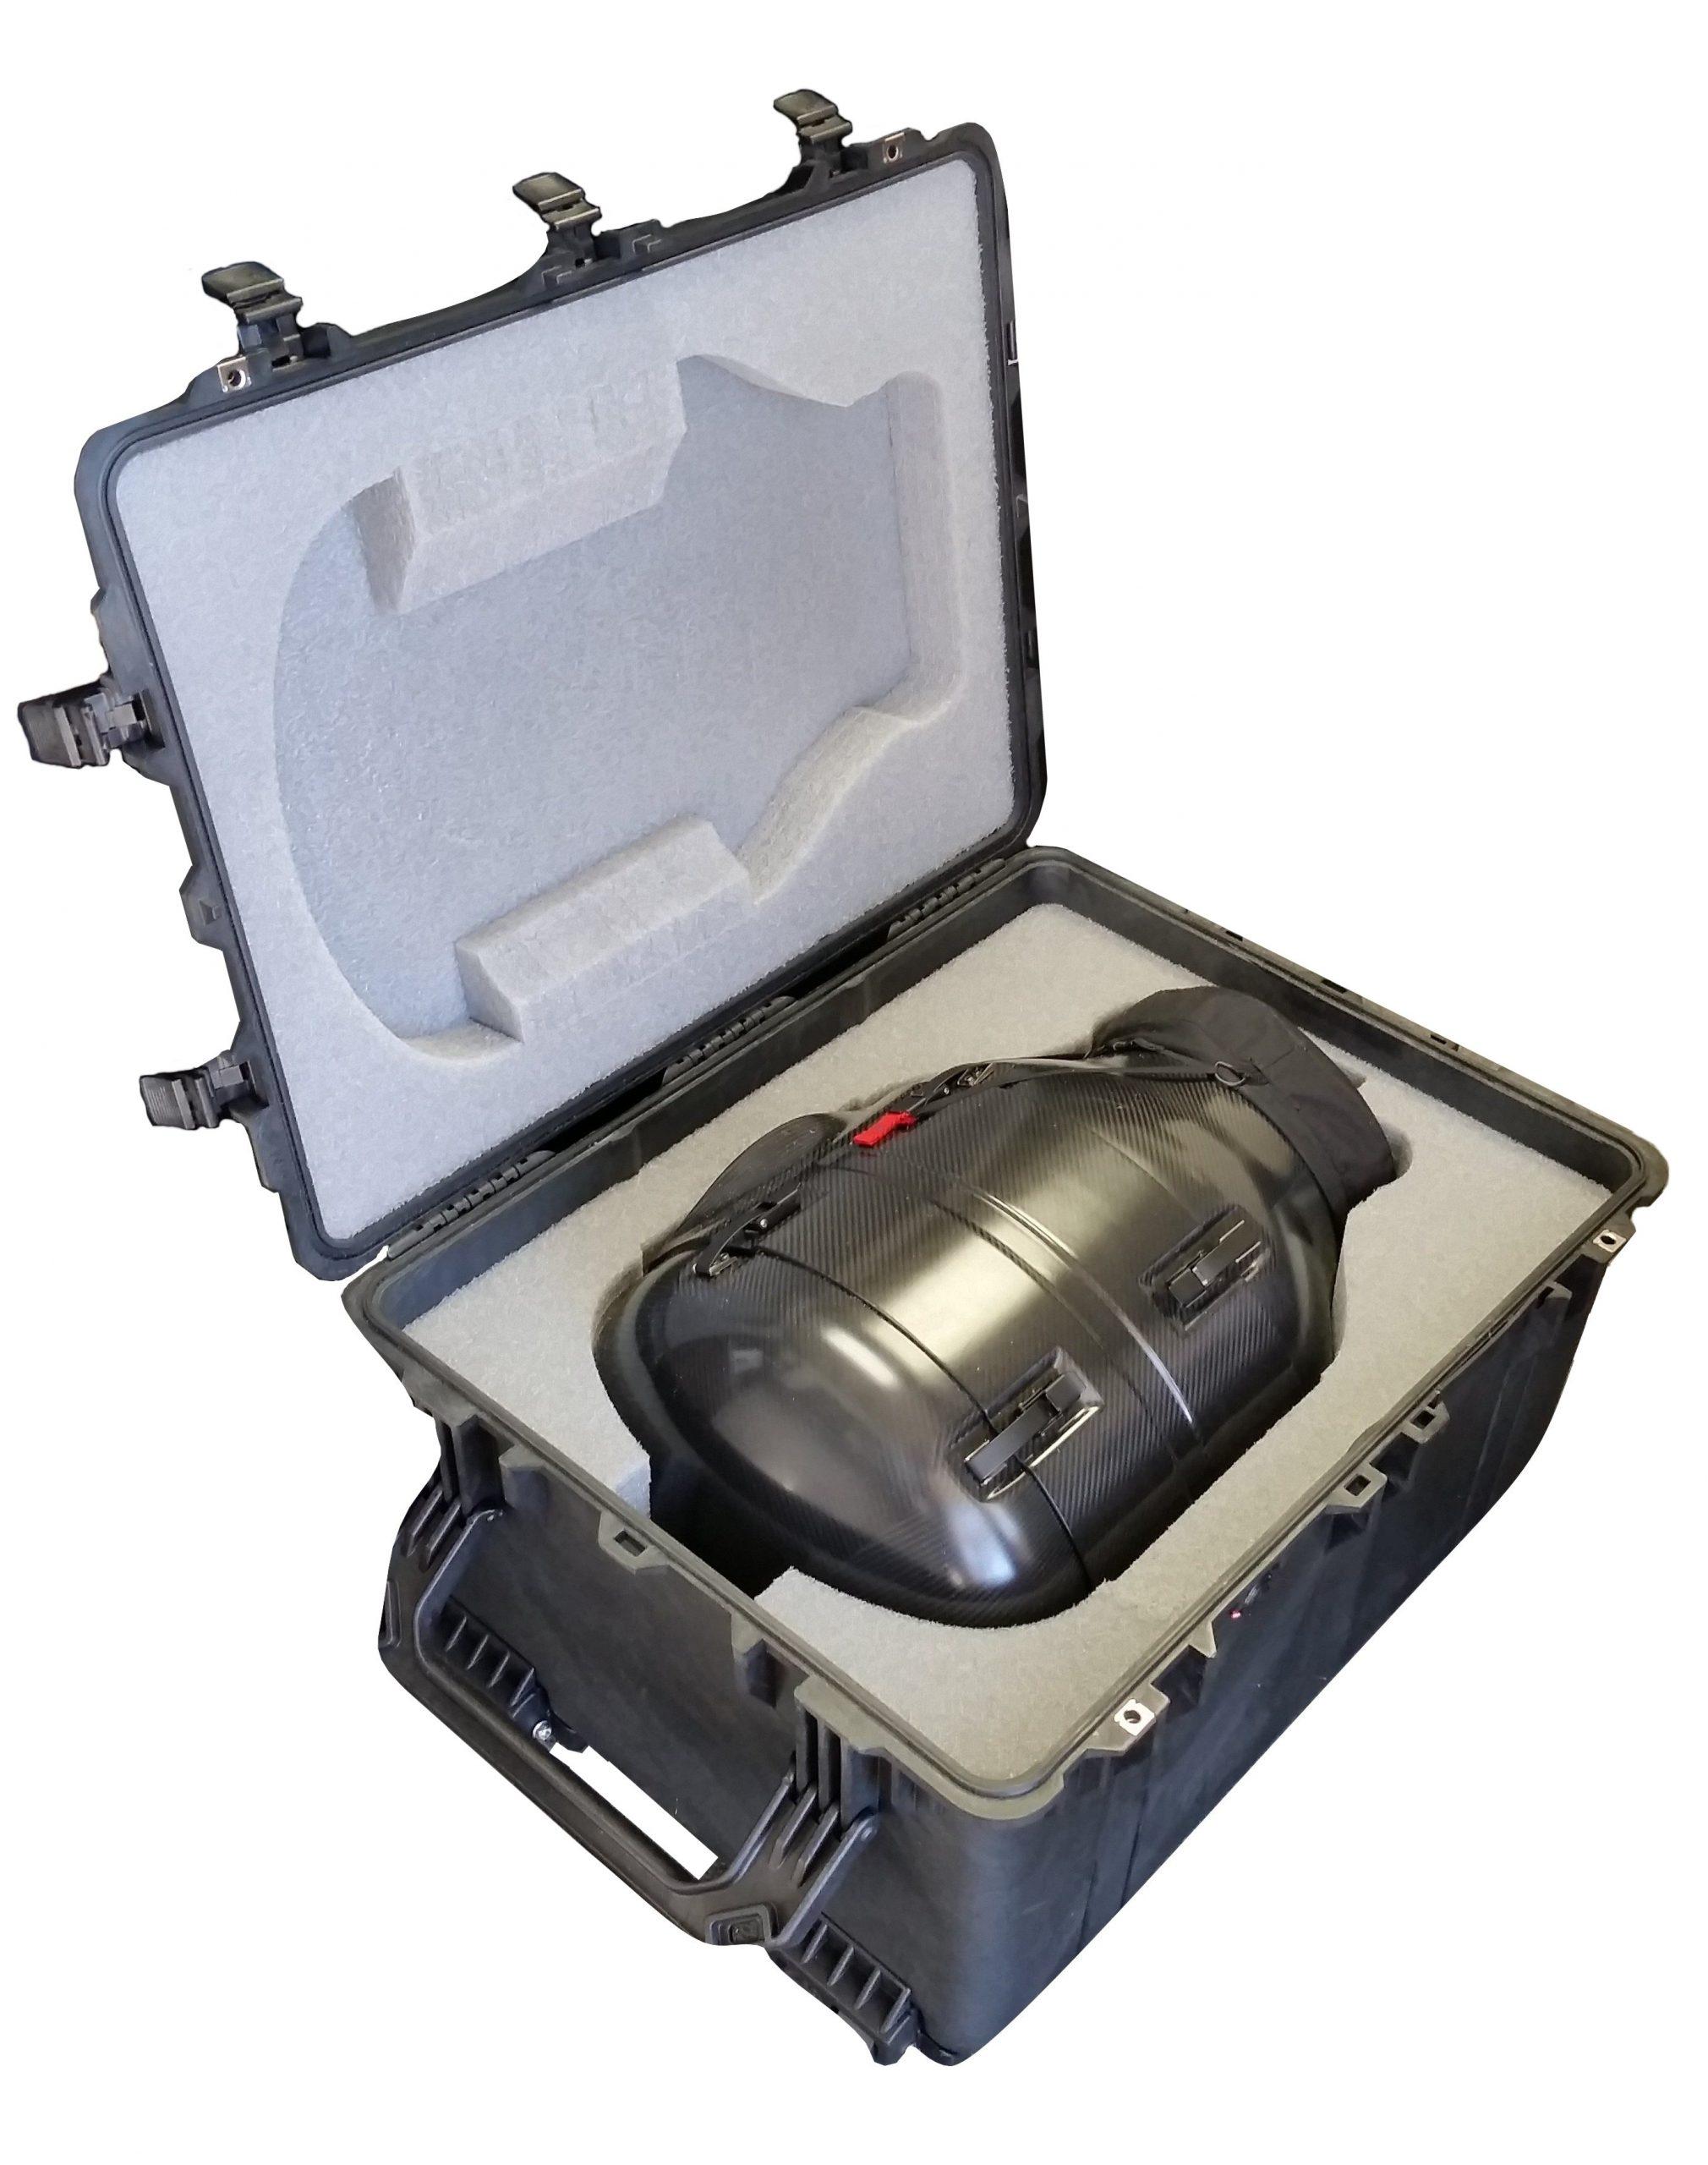 Case Club CC2922163ISK Case Custom Foam Example: Shotover F1 Camera System Case For Gimbal Shroud